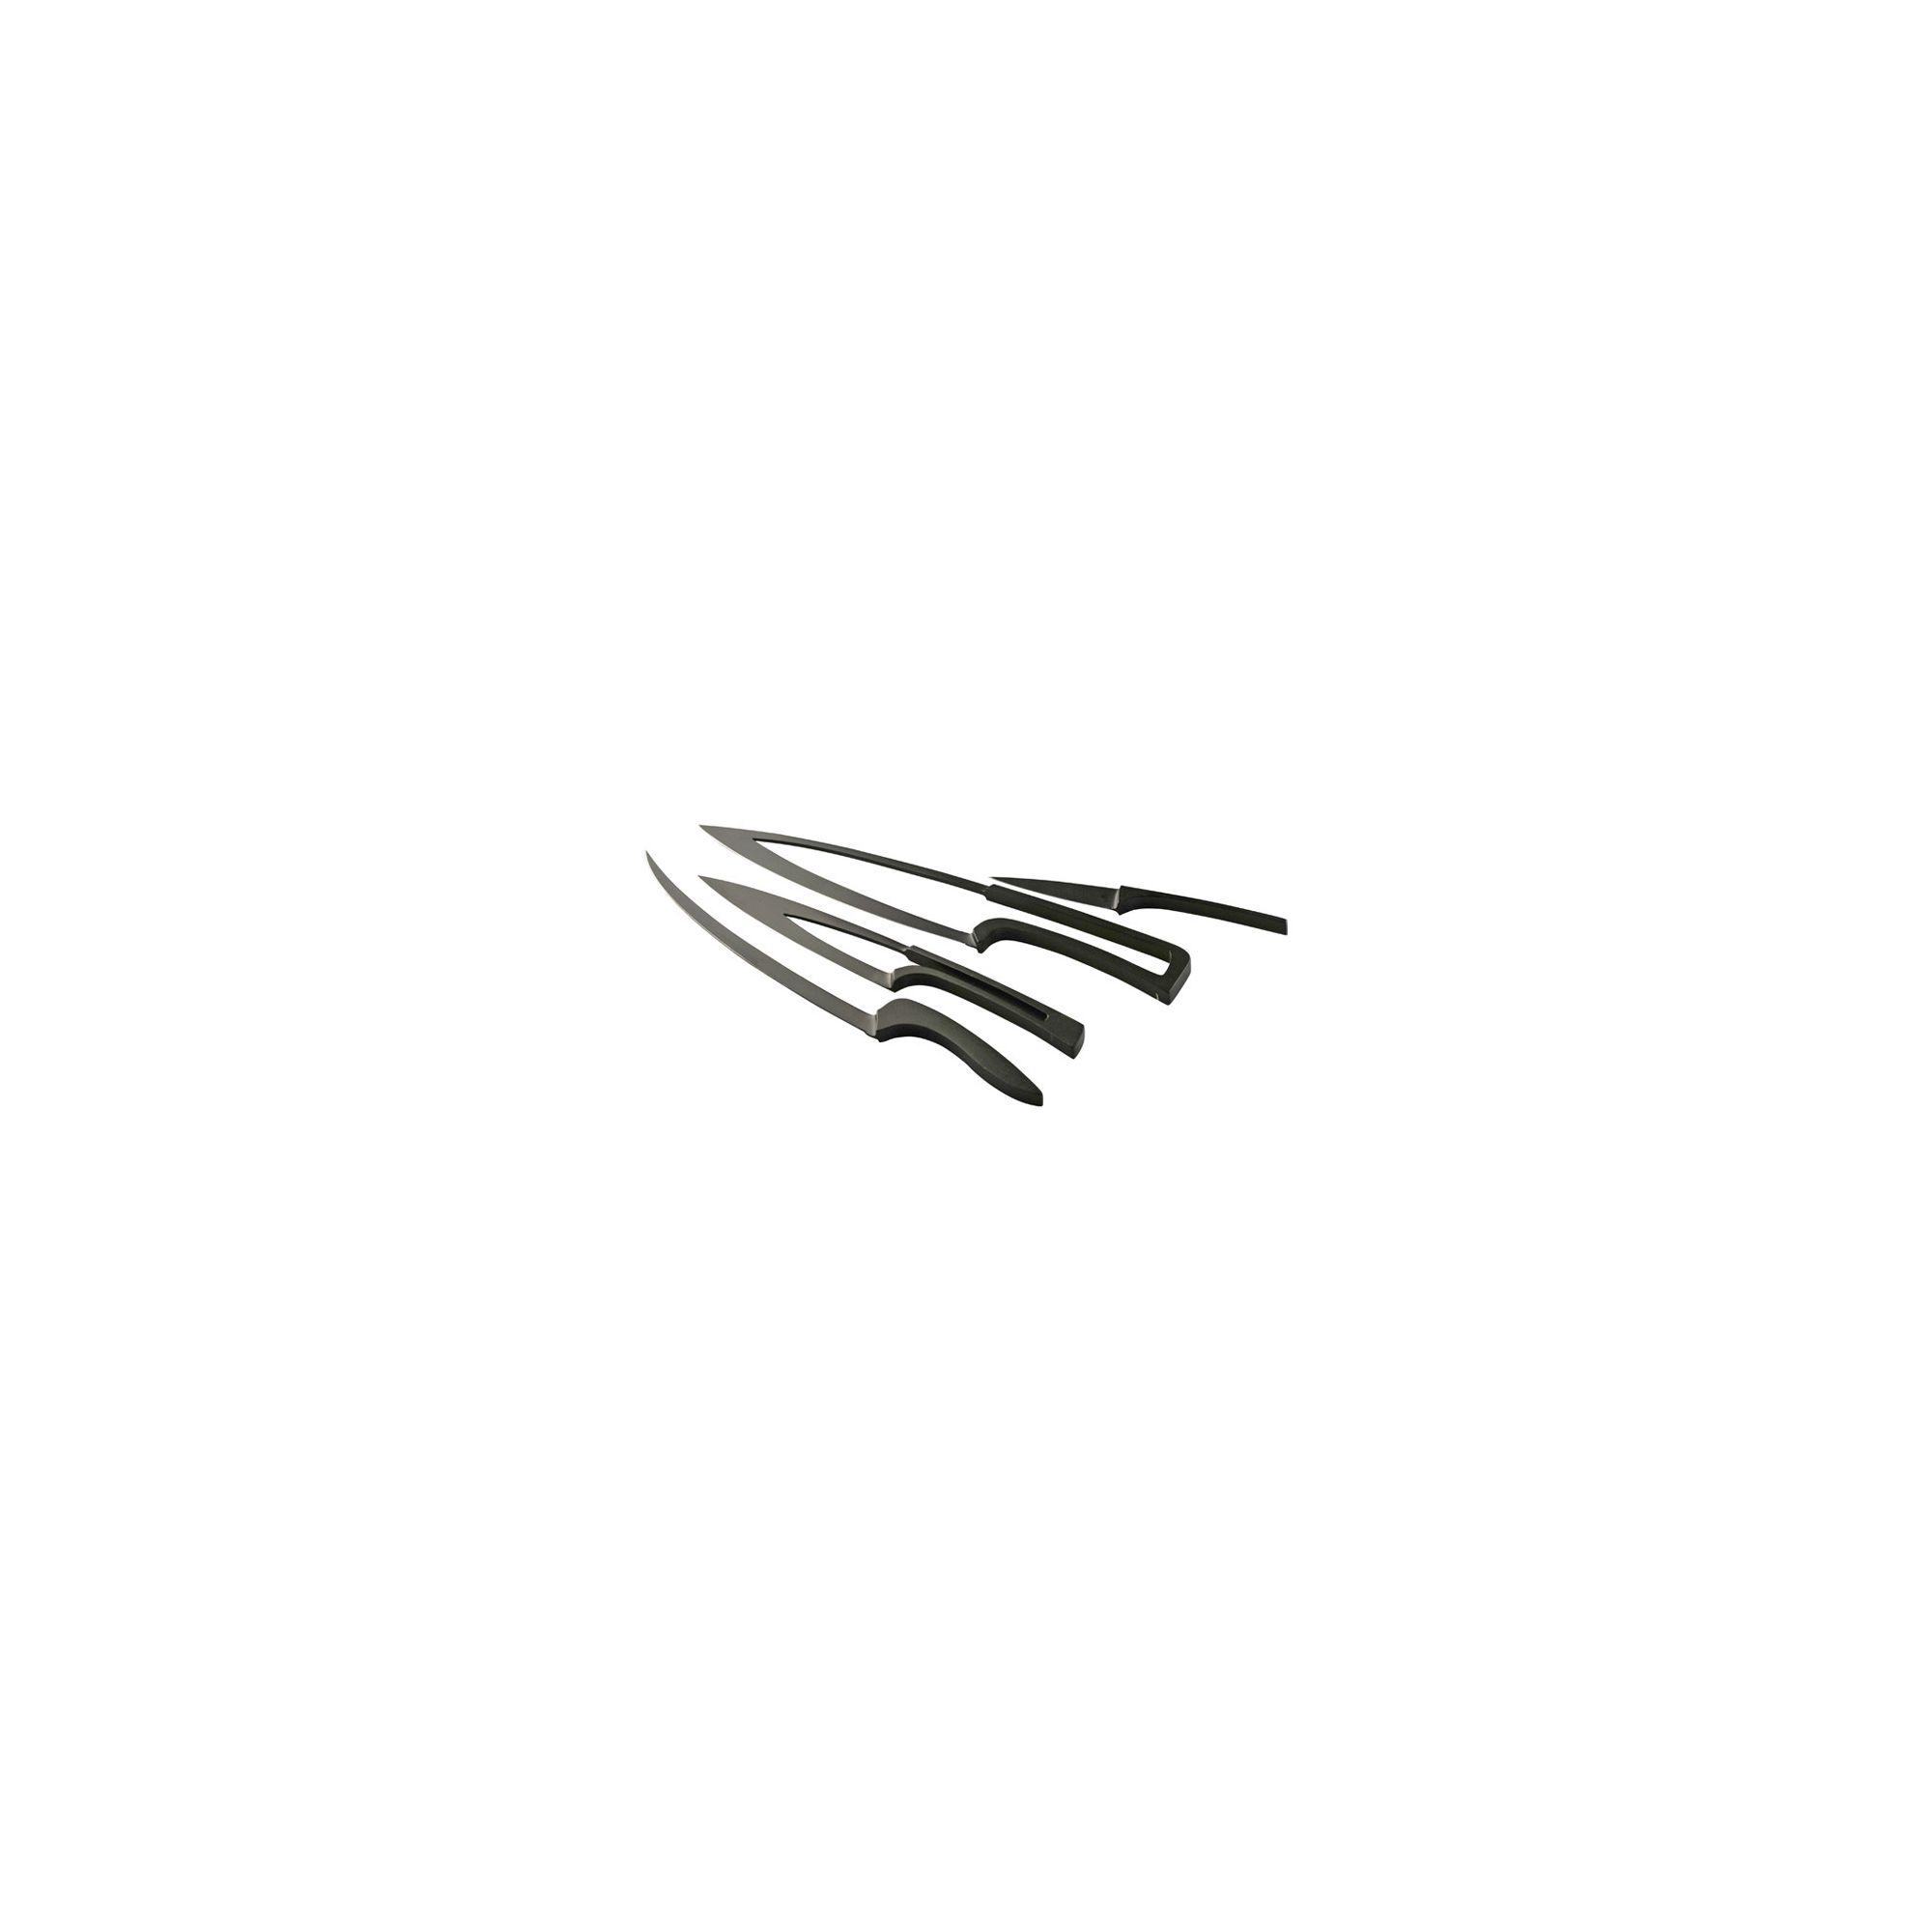 Déglon Meeting Knives 4 Piece Non-Stick Knife Set at Tesco Direct